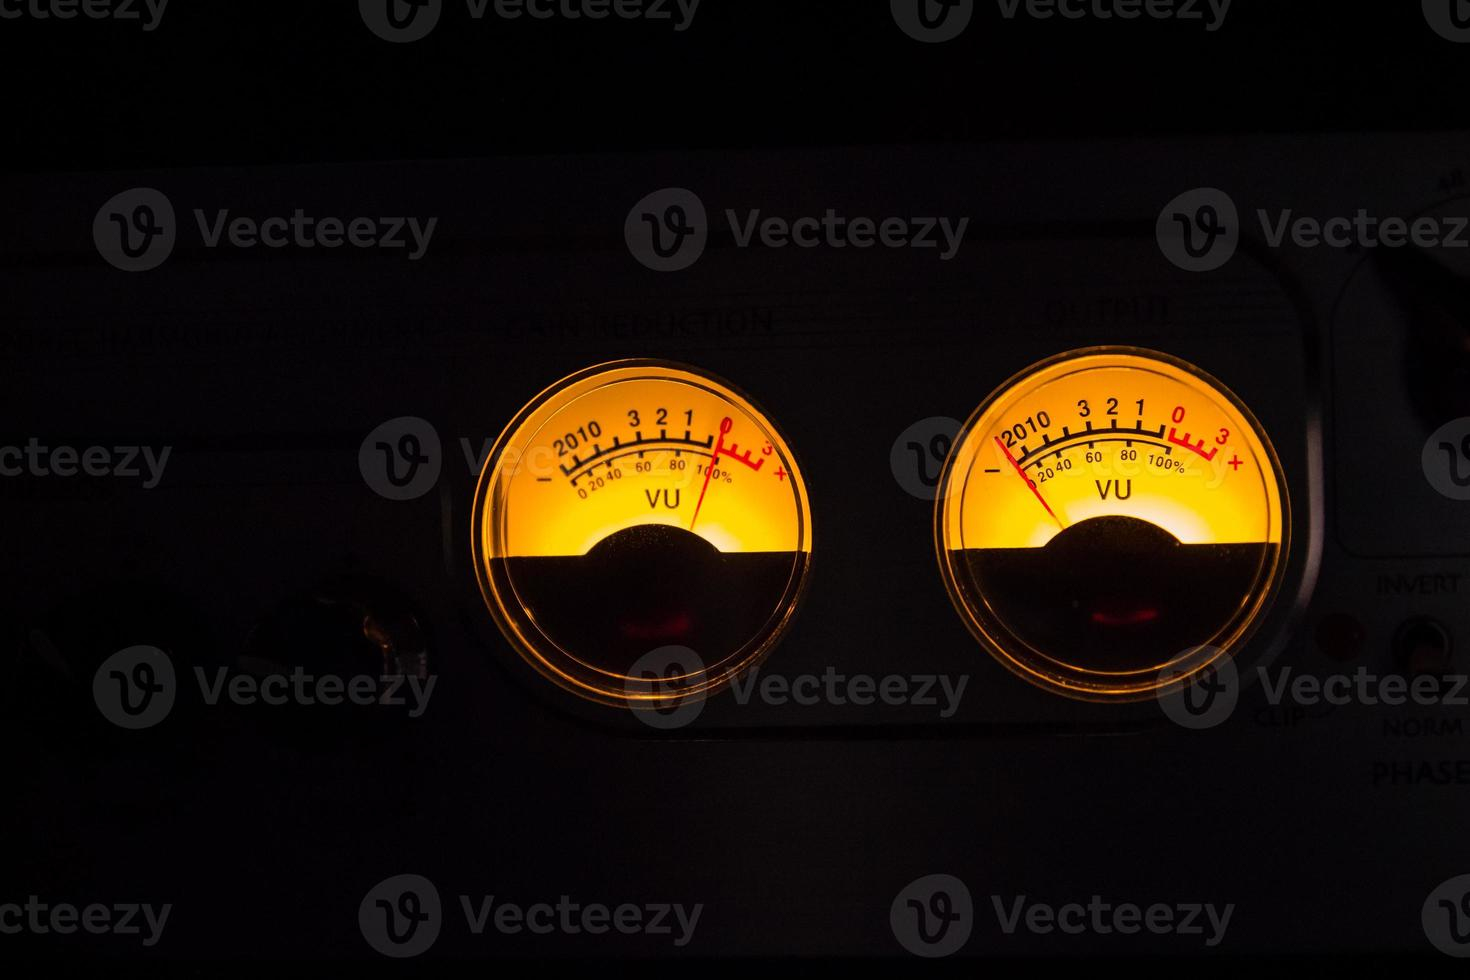 analoge vu-meters gloeien op zwarte achtergrond foto